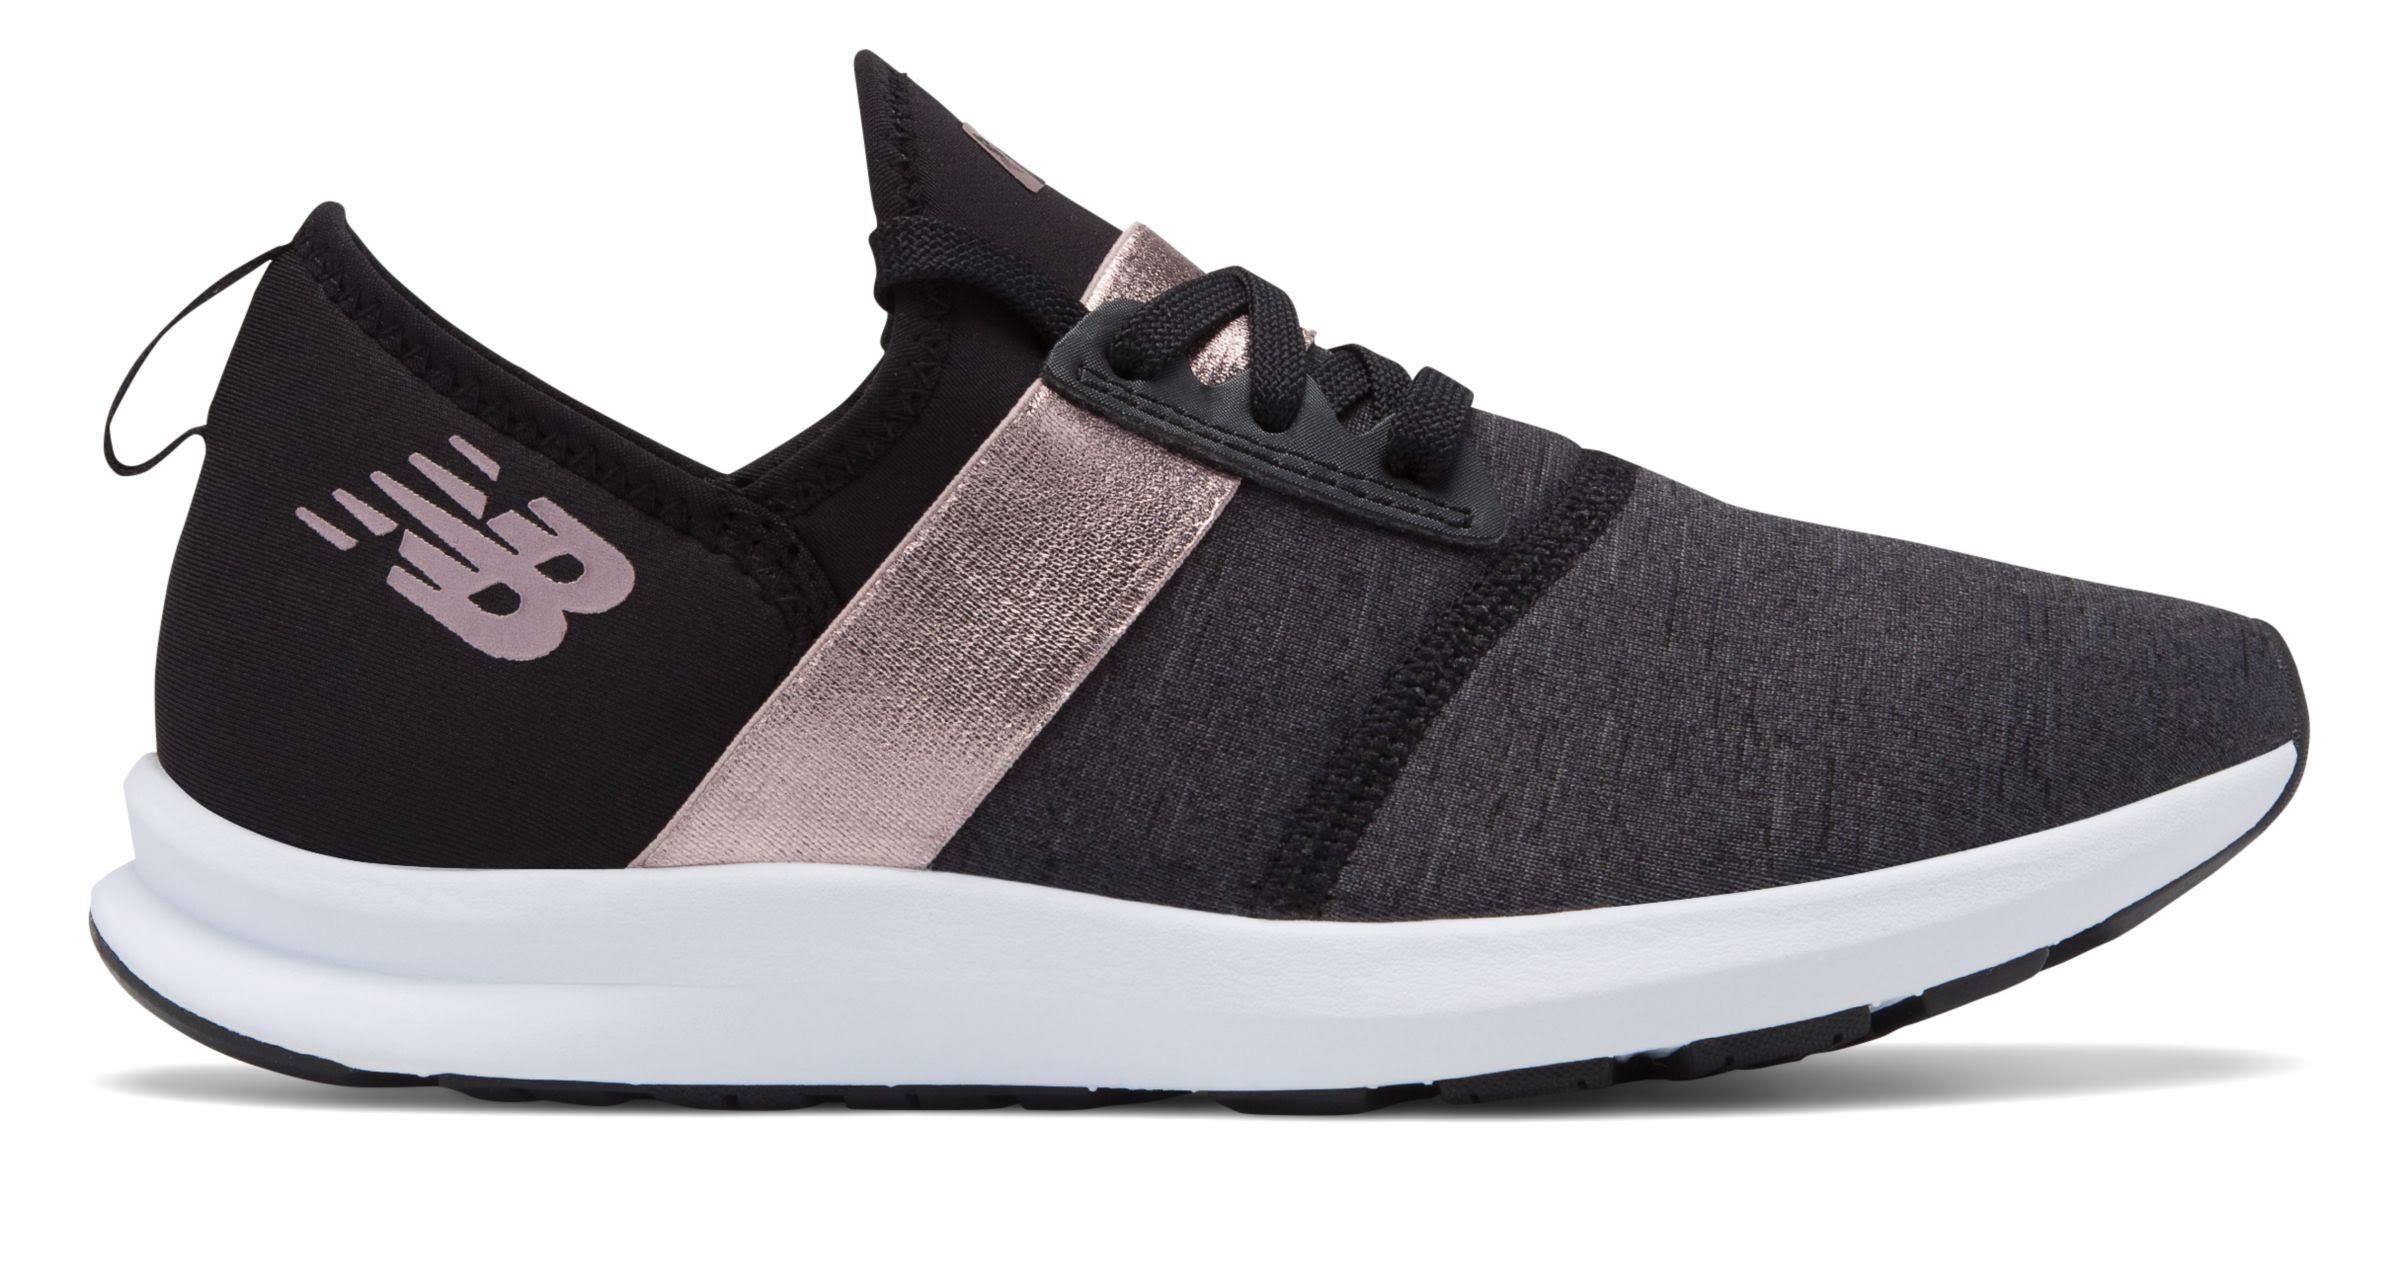 Sneaker Gold Fuelcore Blk 9 rose B Nergize Womens New Balance Black RFxwYqvSn